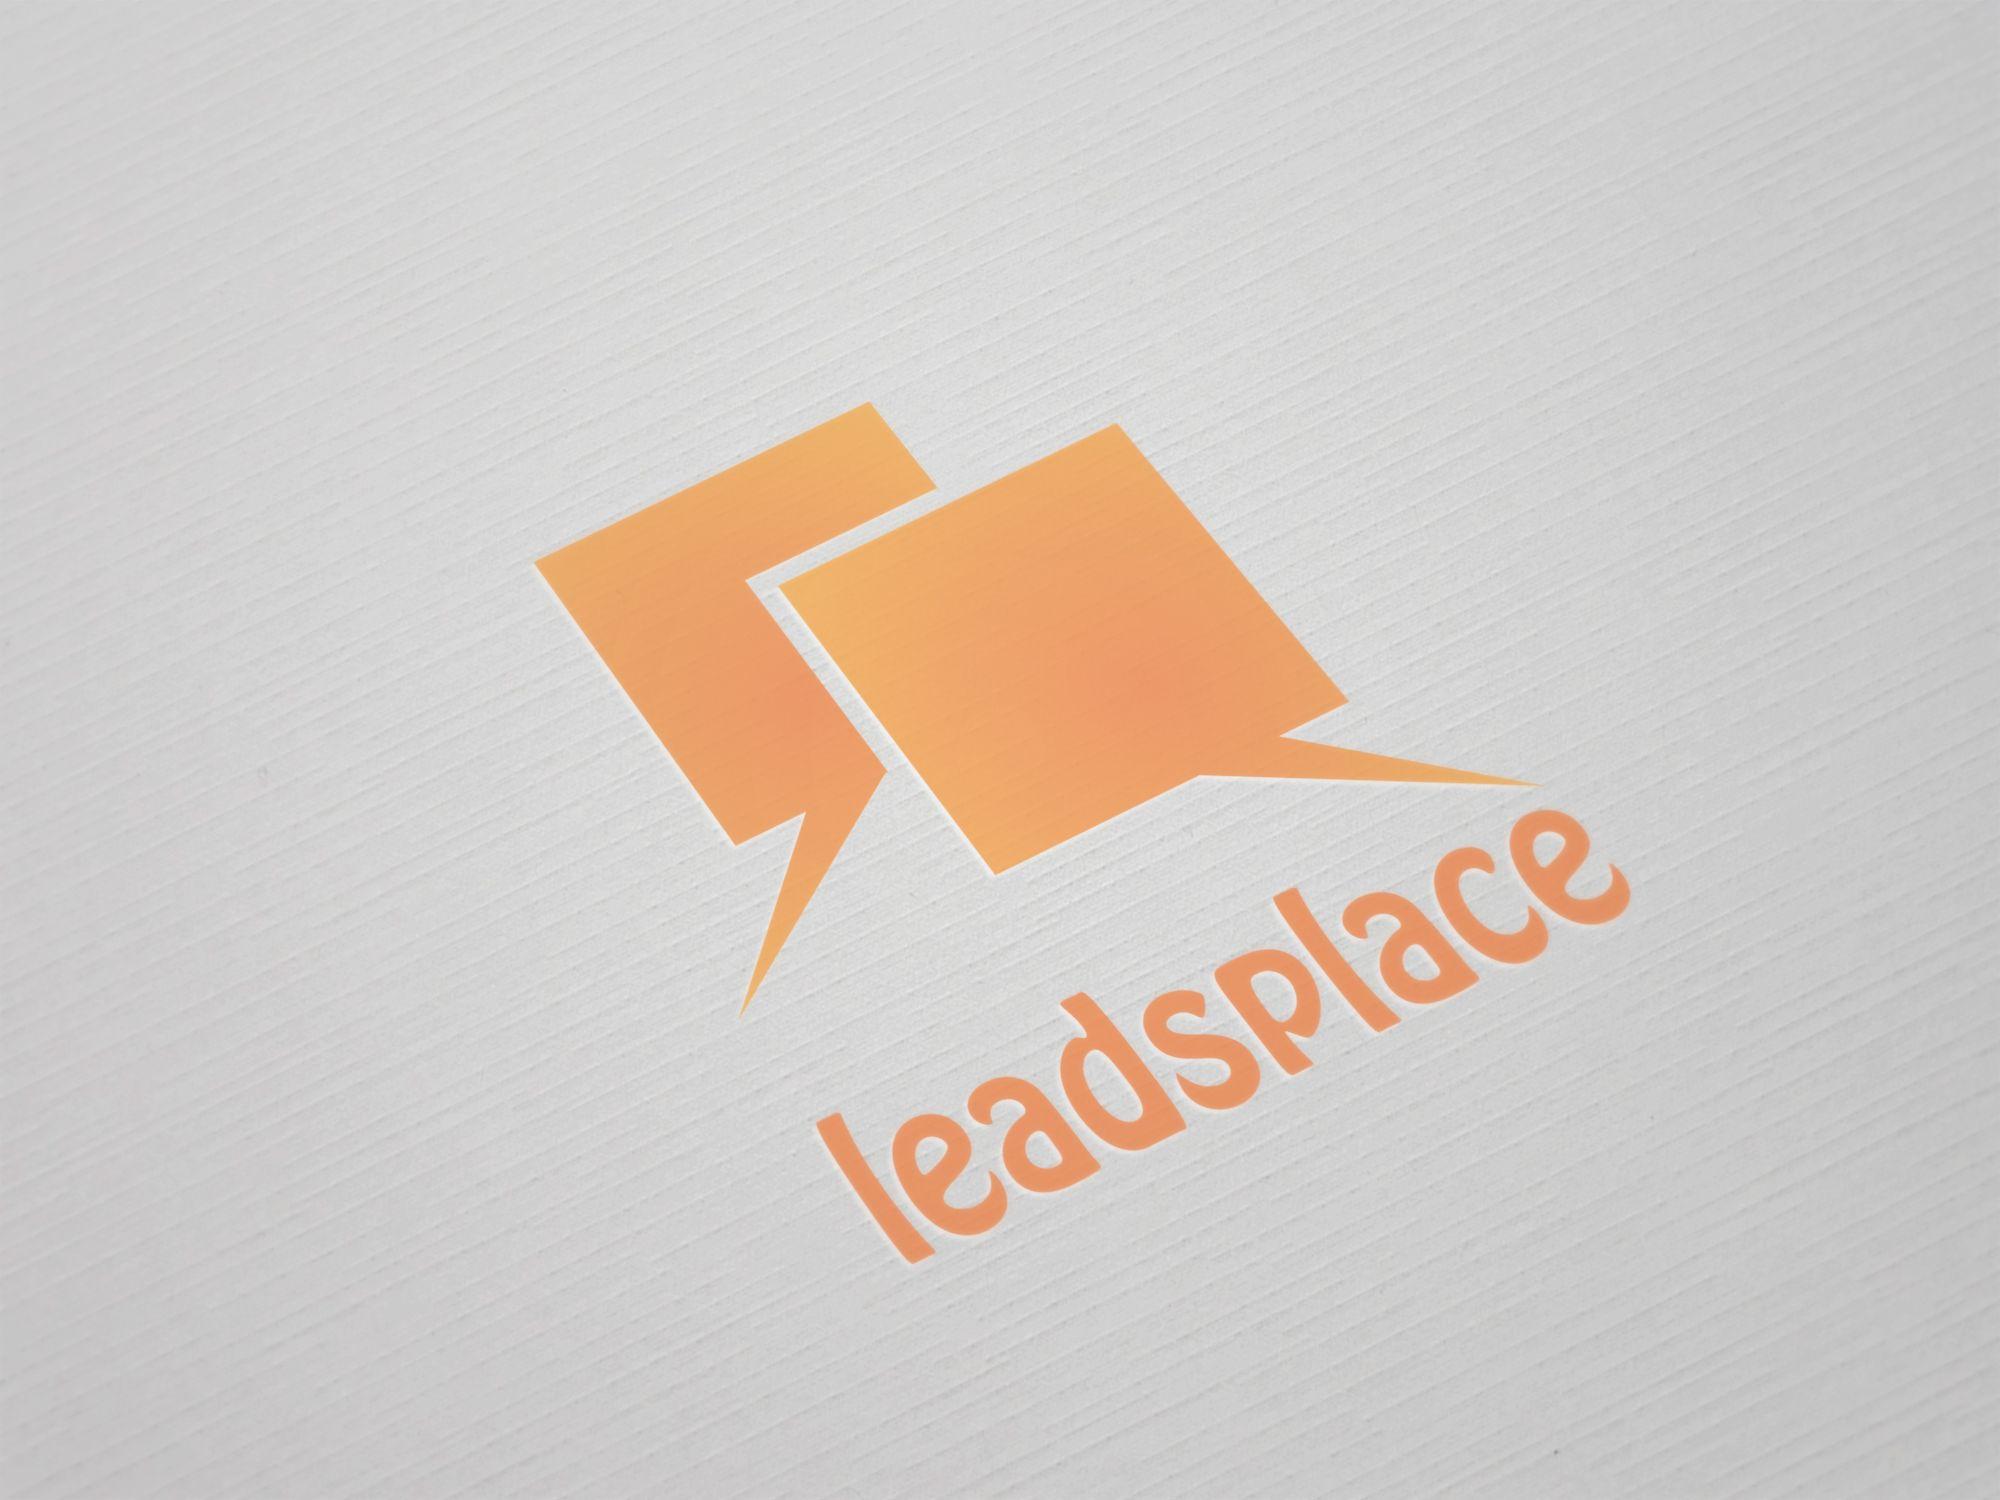 leadsplace.com - логотип - дизайнер Lepata